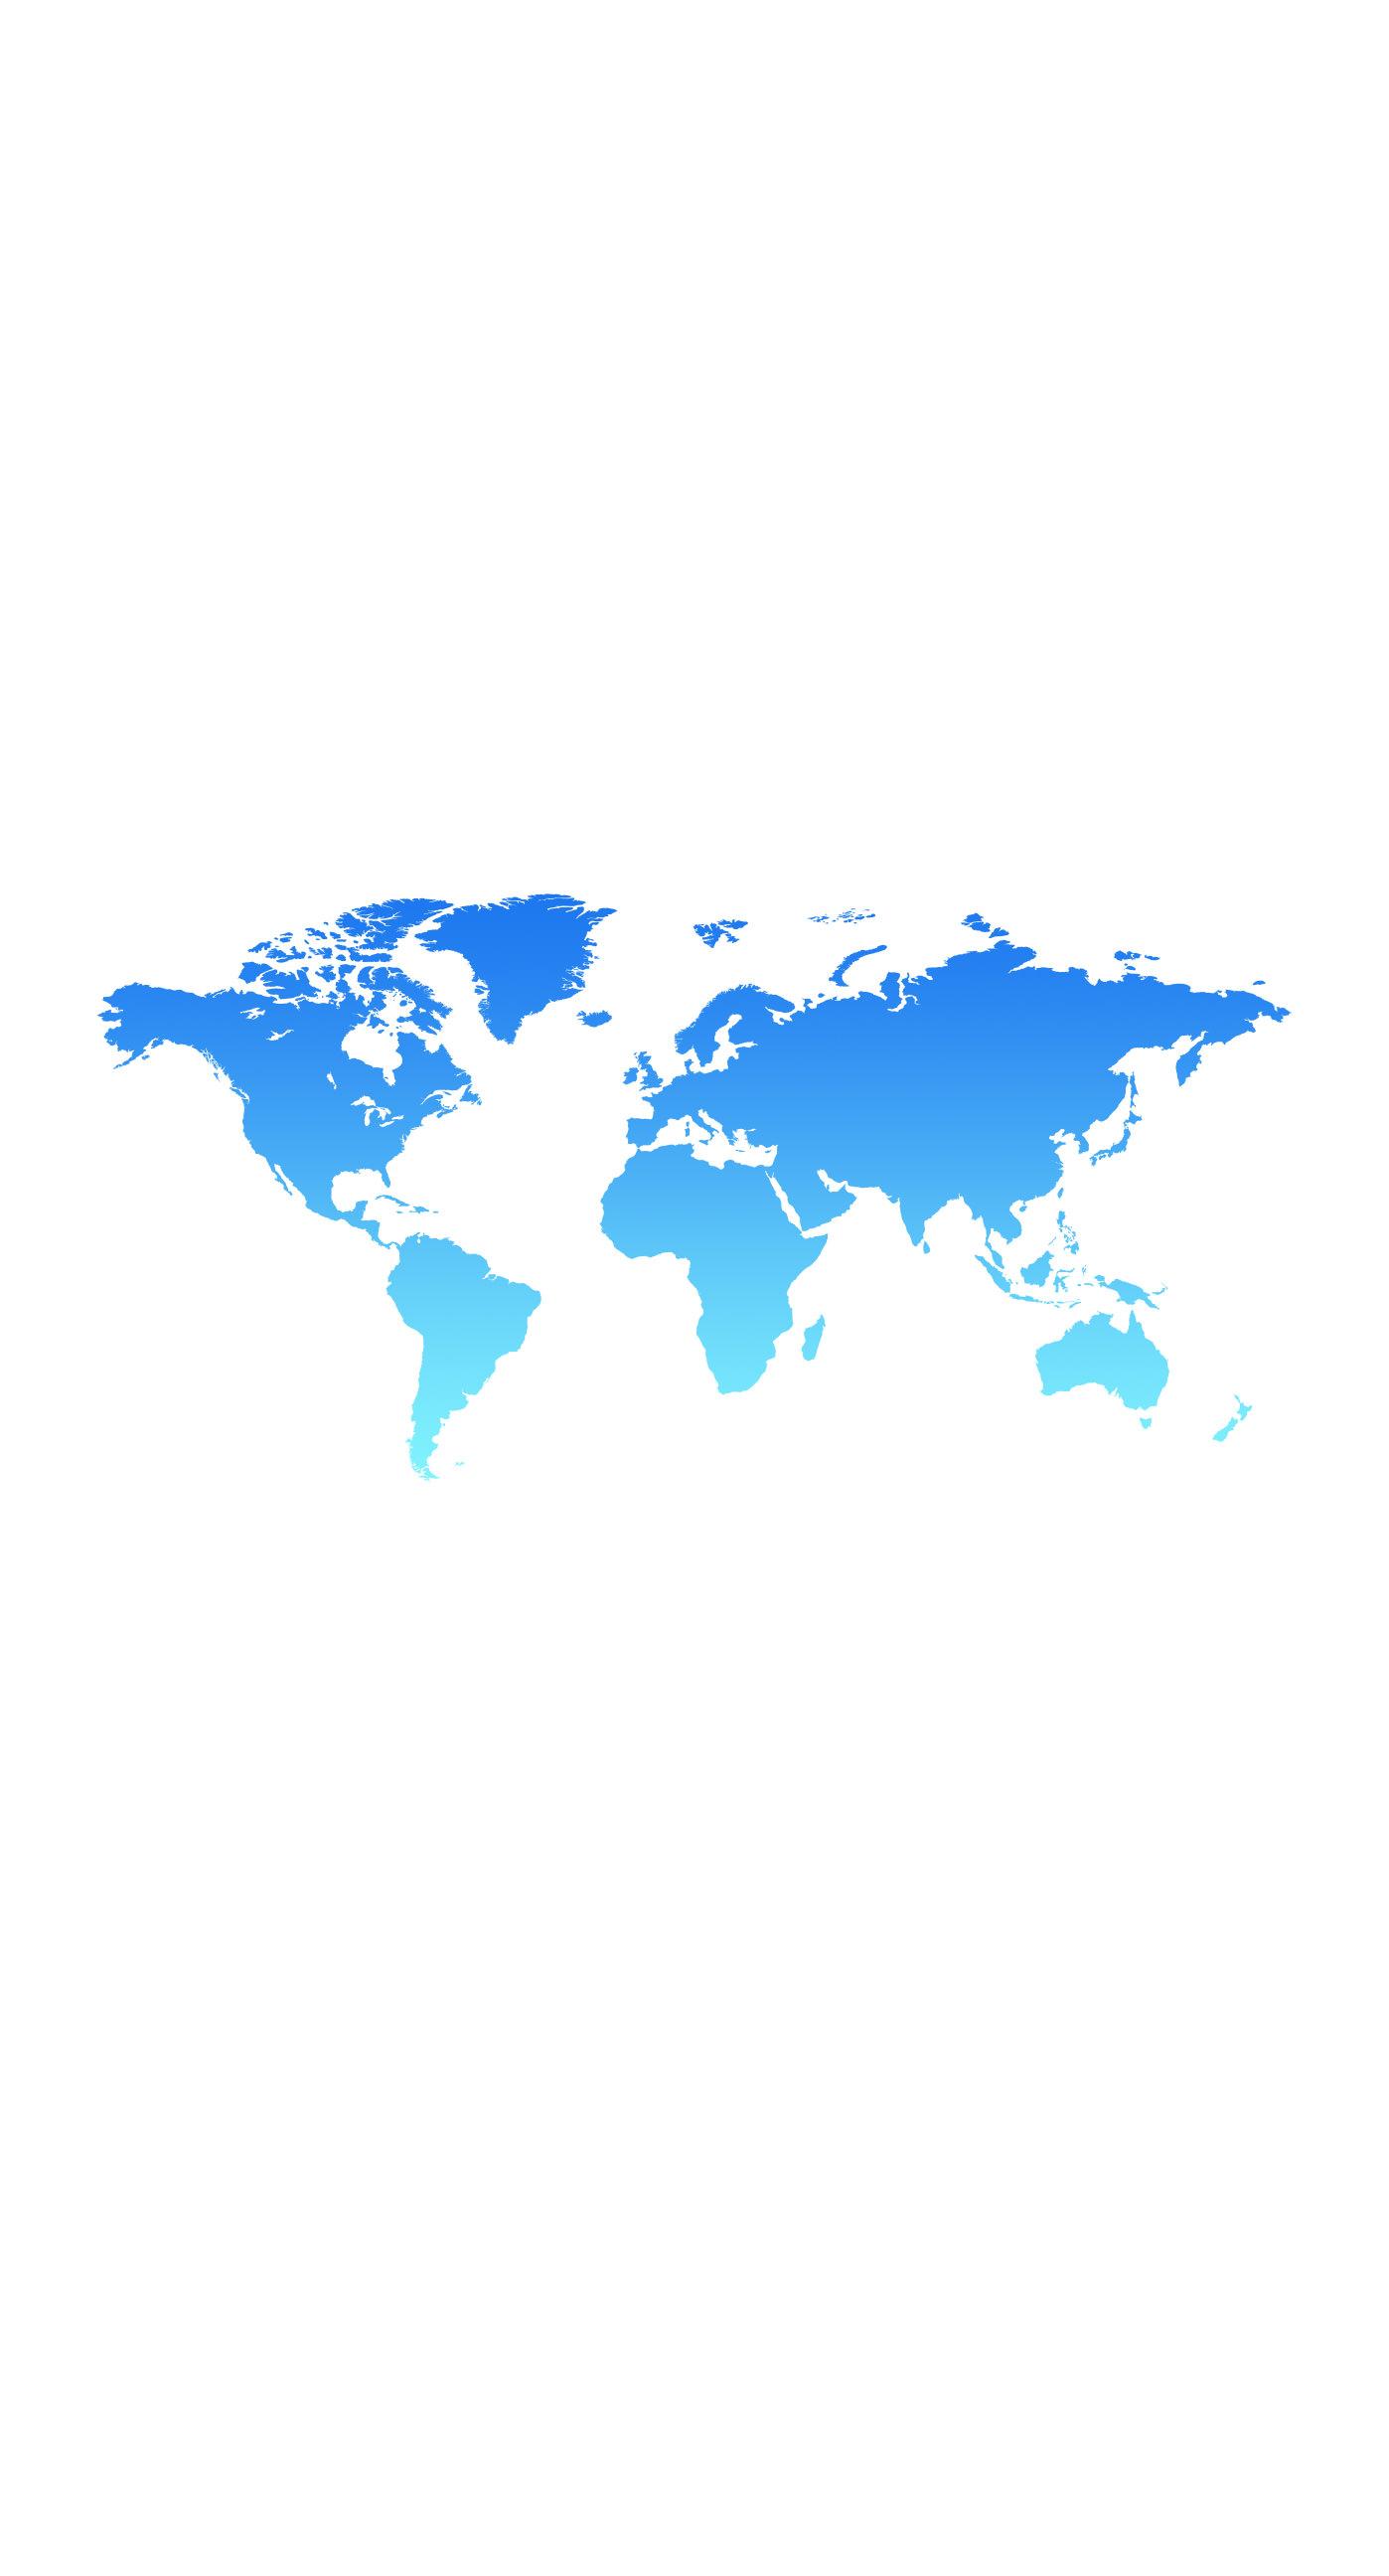 Illustration world map blue wallpaper iphone6splus iphone 6s plus iphone 6 plus wallpaper gumiabroncs Images